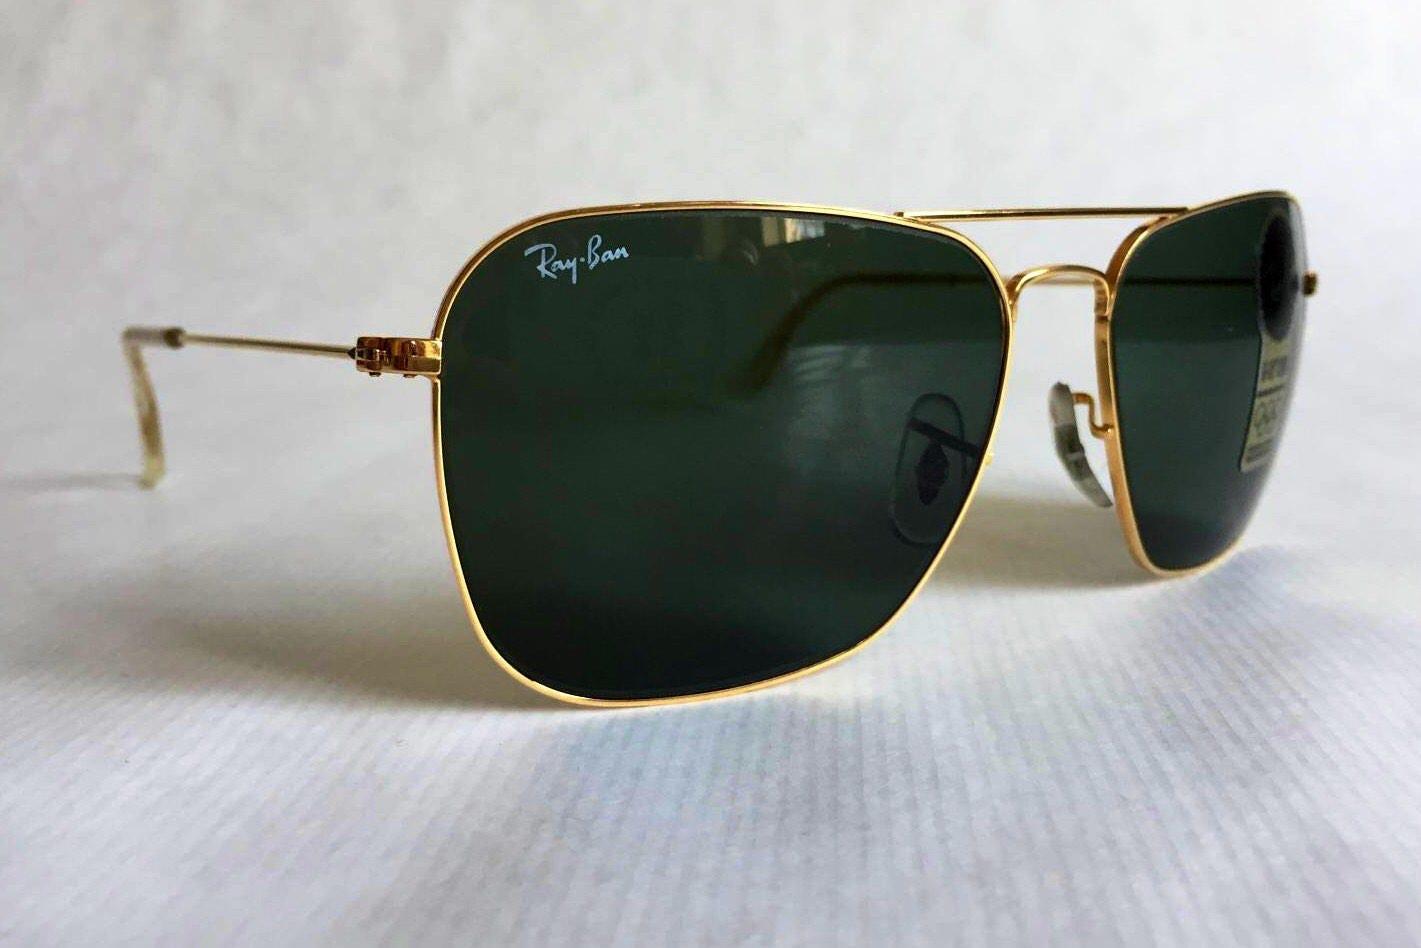 2a11f590f2f Ray-Ban Caravan by Bausch   Lomb Vintage Sunglasses New Unworn Deadstock